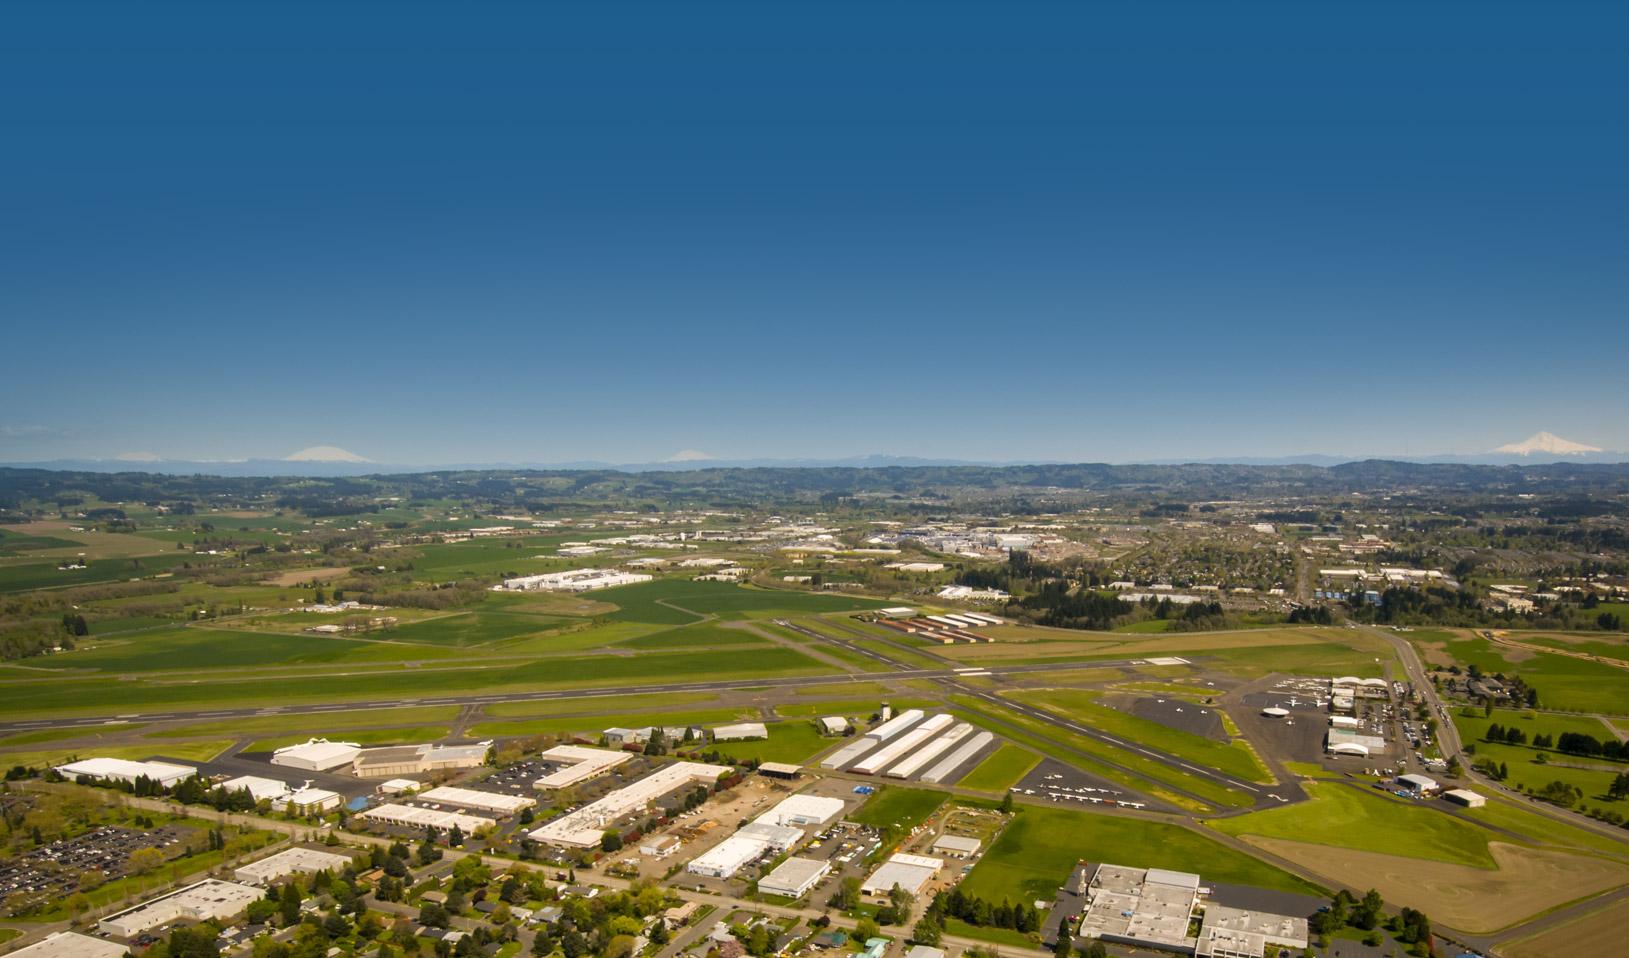 Port of Portland - Hillsboro Airport